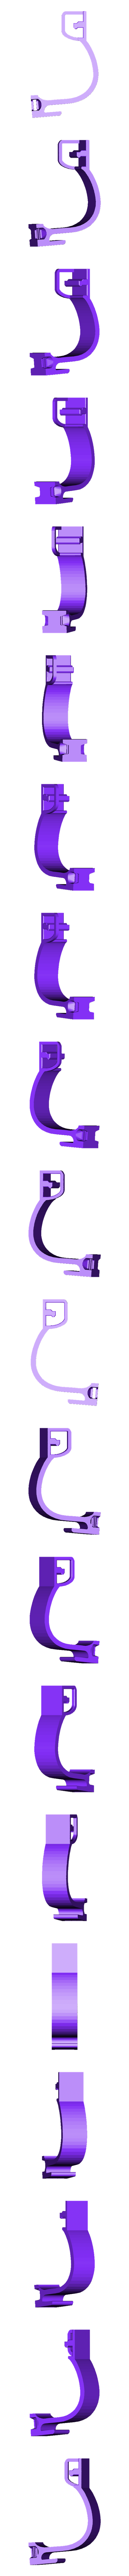 Mavicipad_left.stl Download free STL file DJI Mavic Ipad bracket with Combo strap snaps • 3D printing template, MatsErik